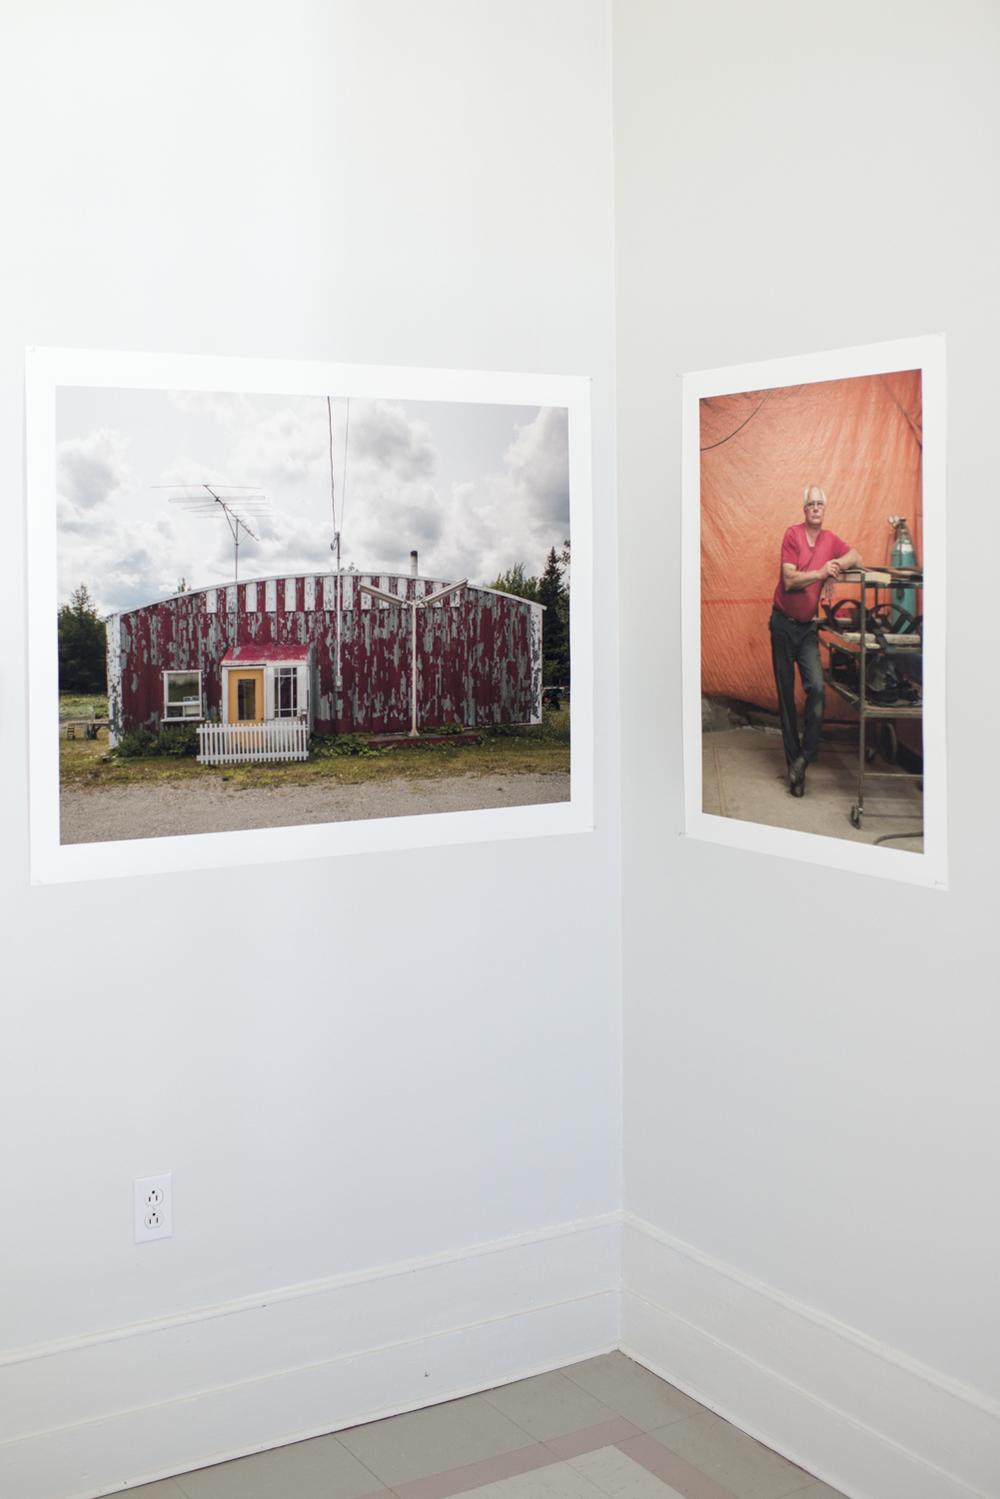 Rencontre Photographique du Kamouraska, 2015